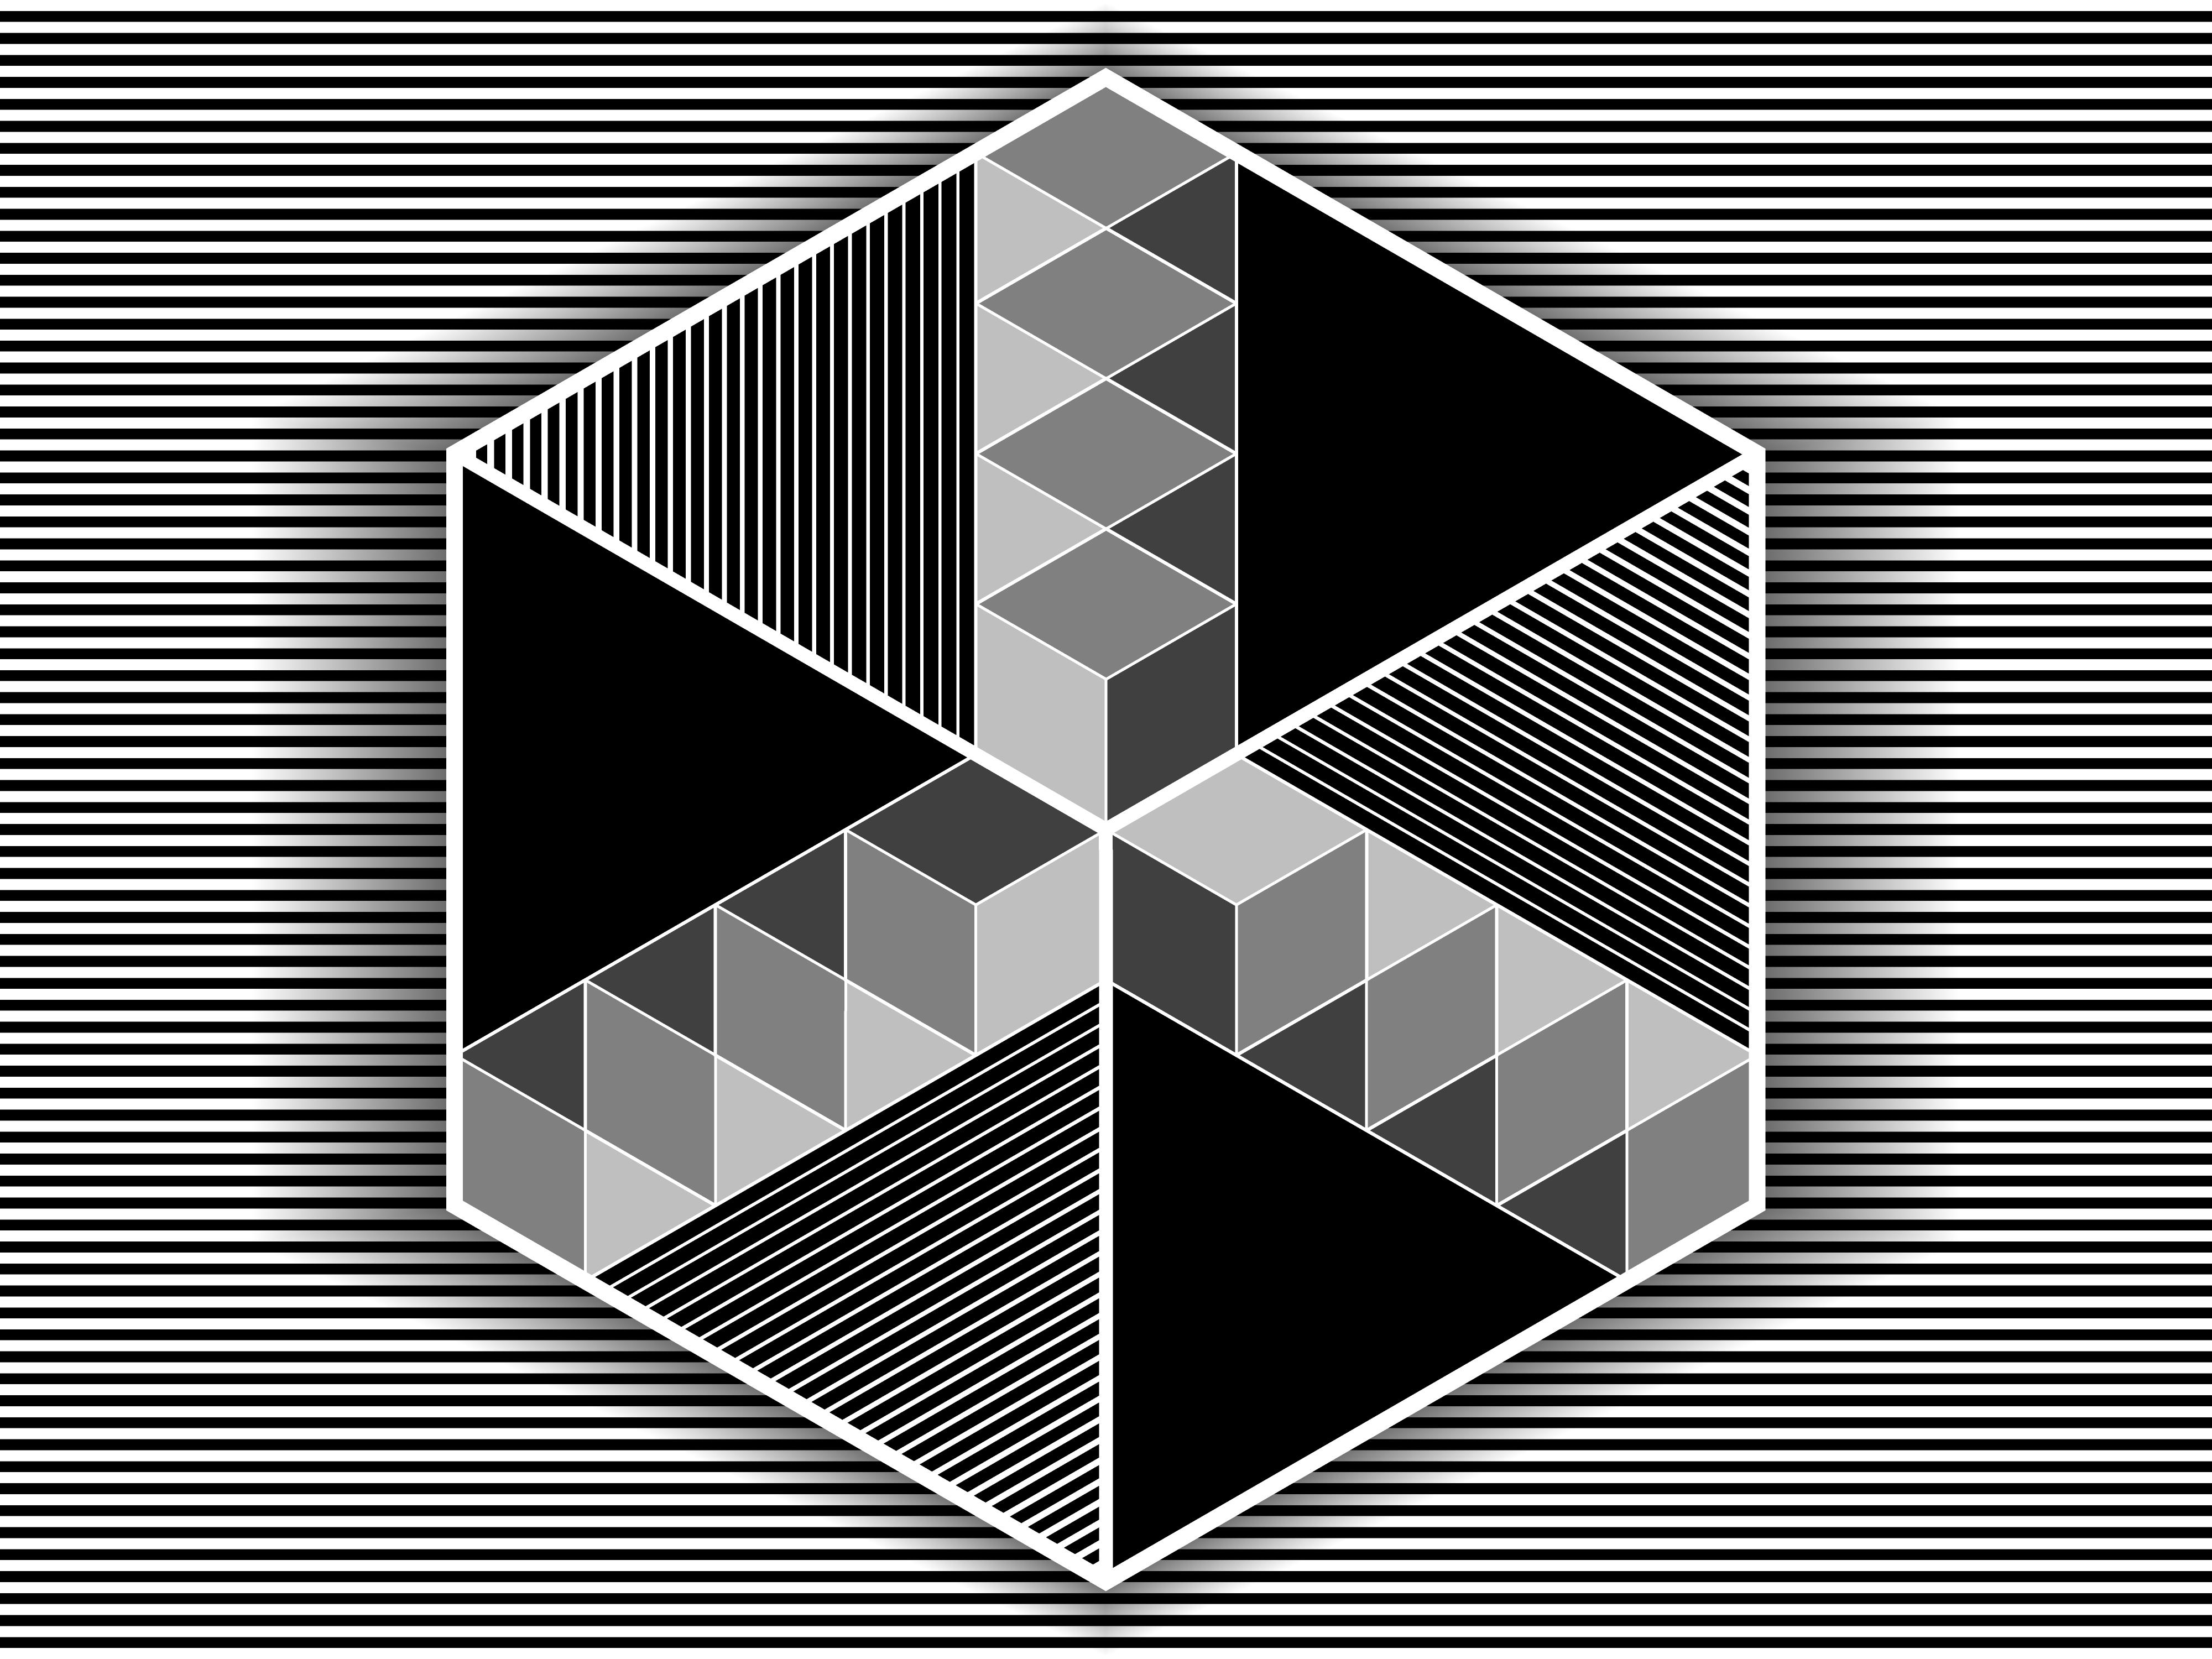 Cubed 18 nov 14 2018 dribbble